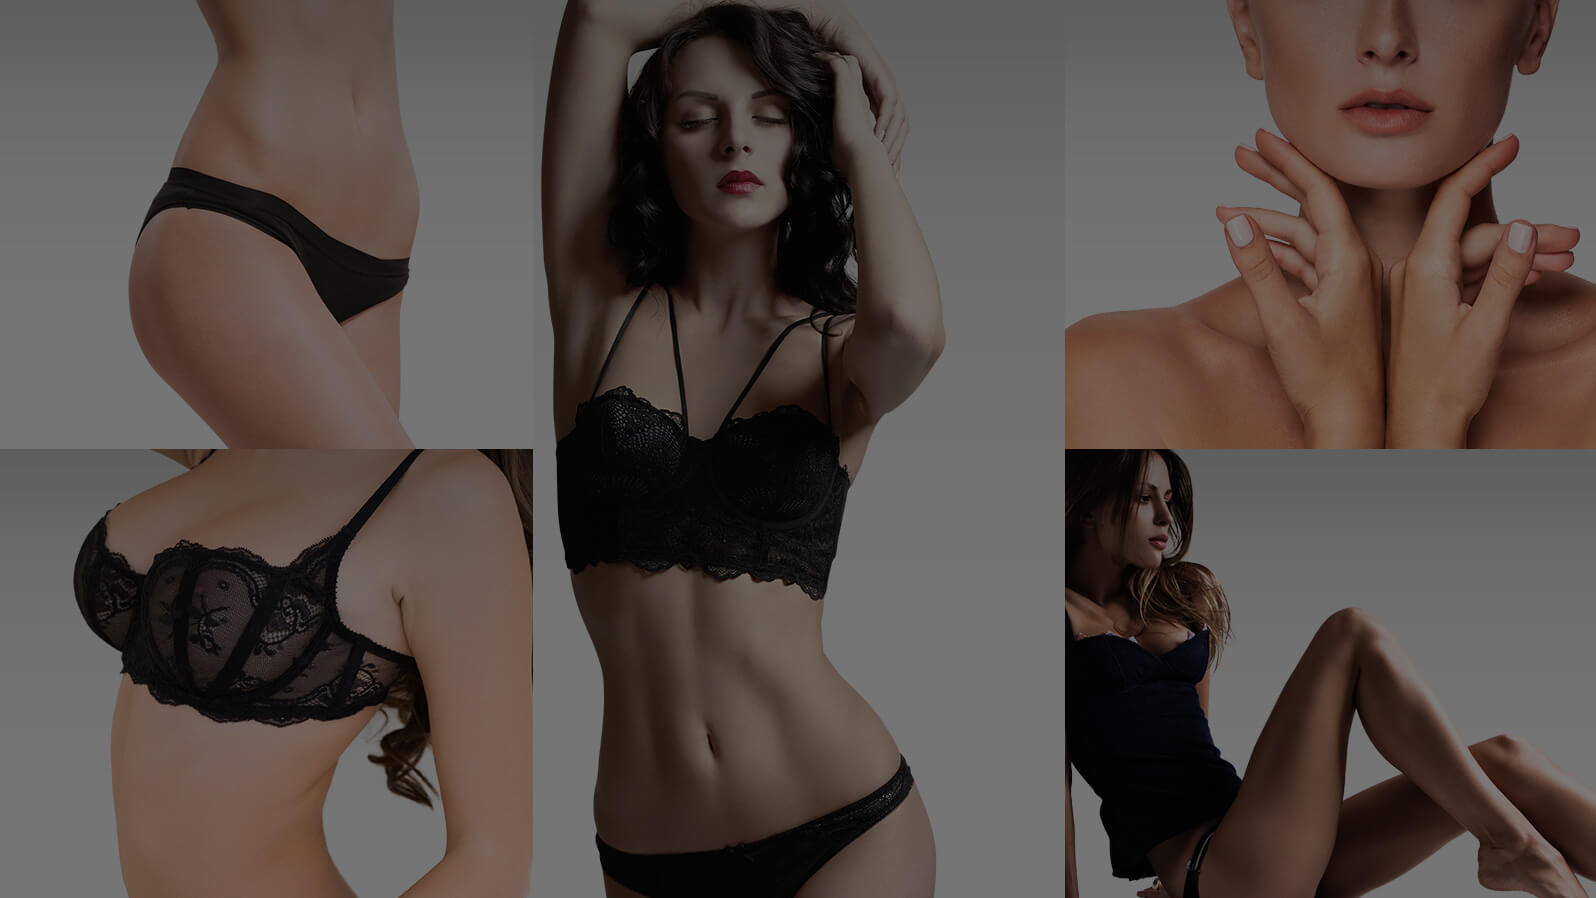 Model Collage Image 2